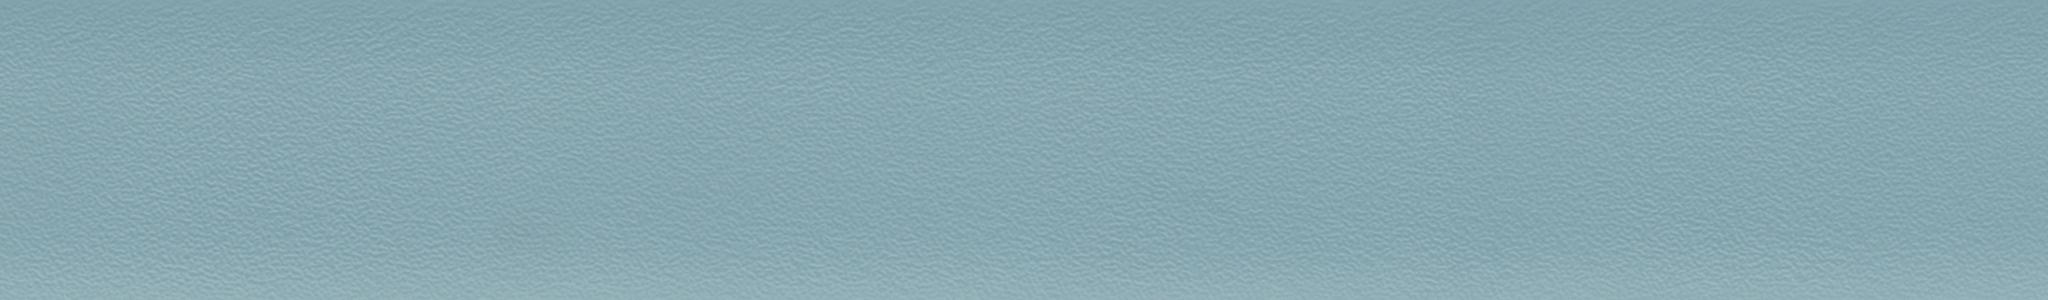 HU 15181 Chant ABS Bleu Azur Perle 101